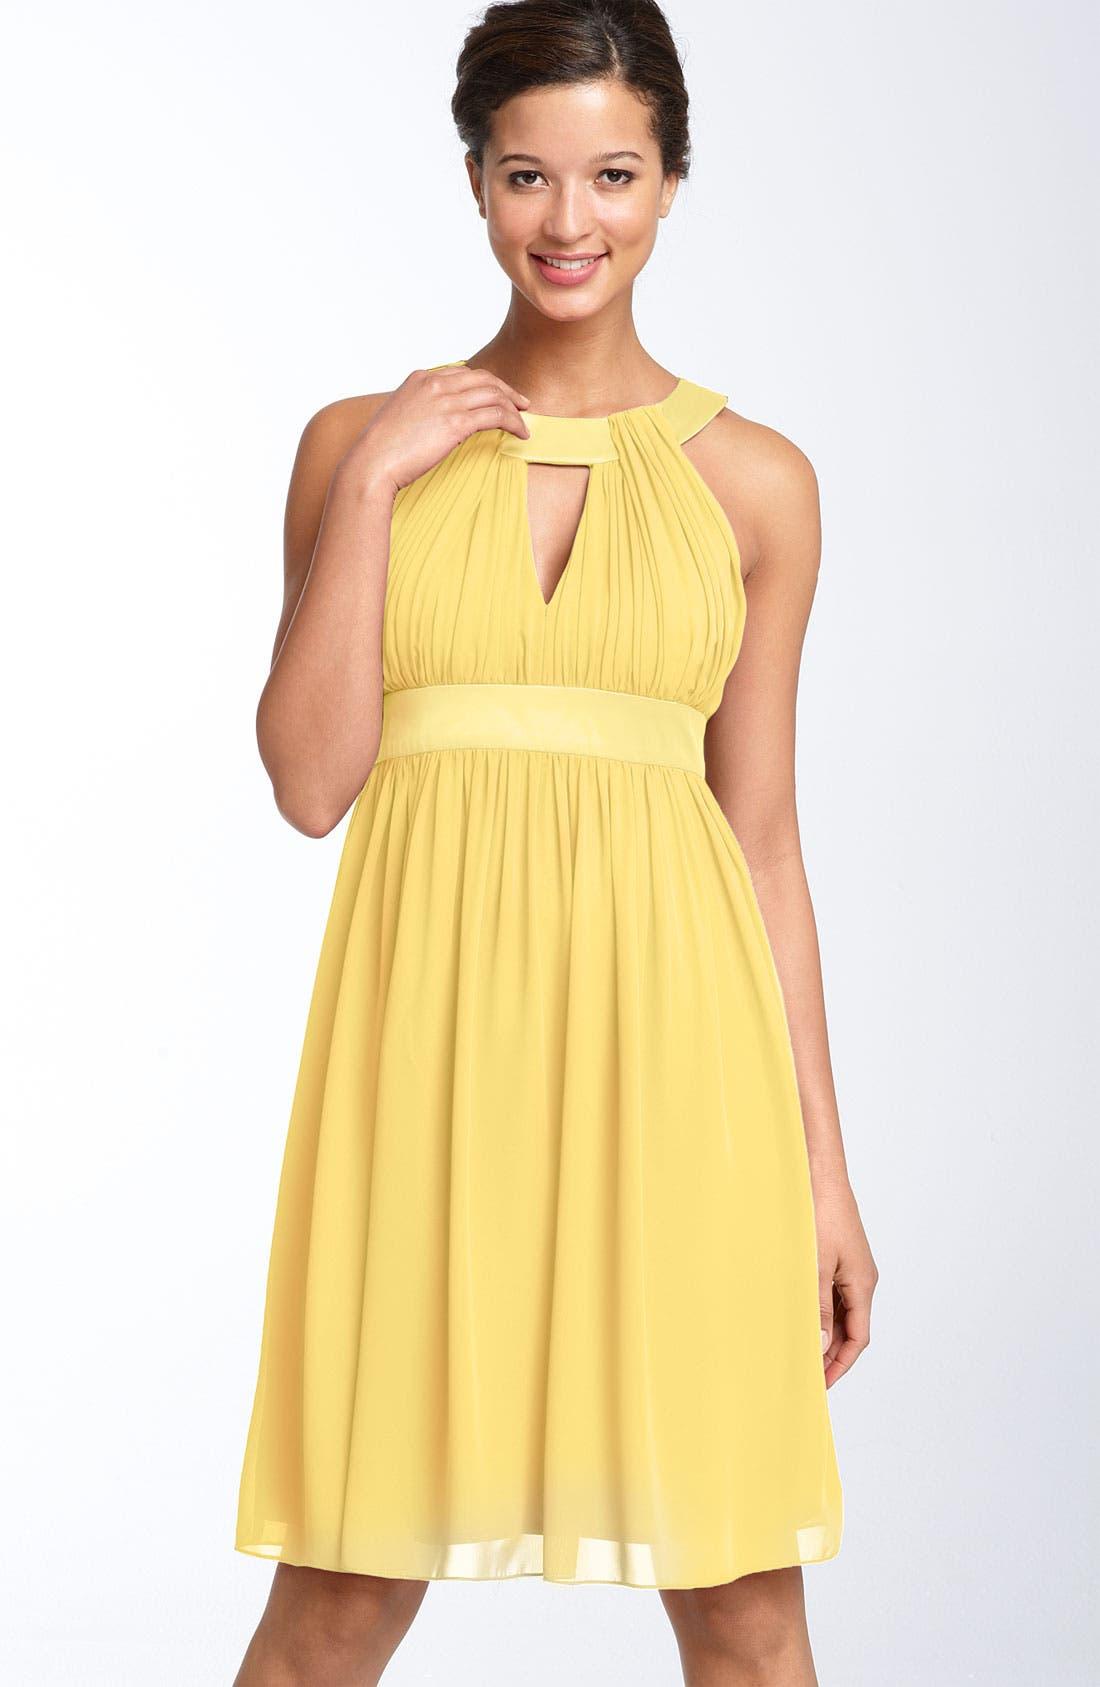 Alternate Image 1 Selected - Maggy London Keyhole Chiffon Dress